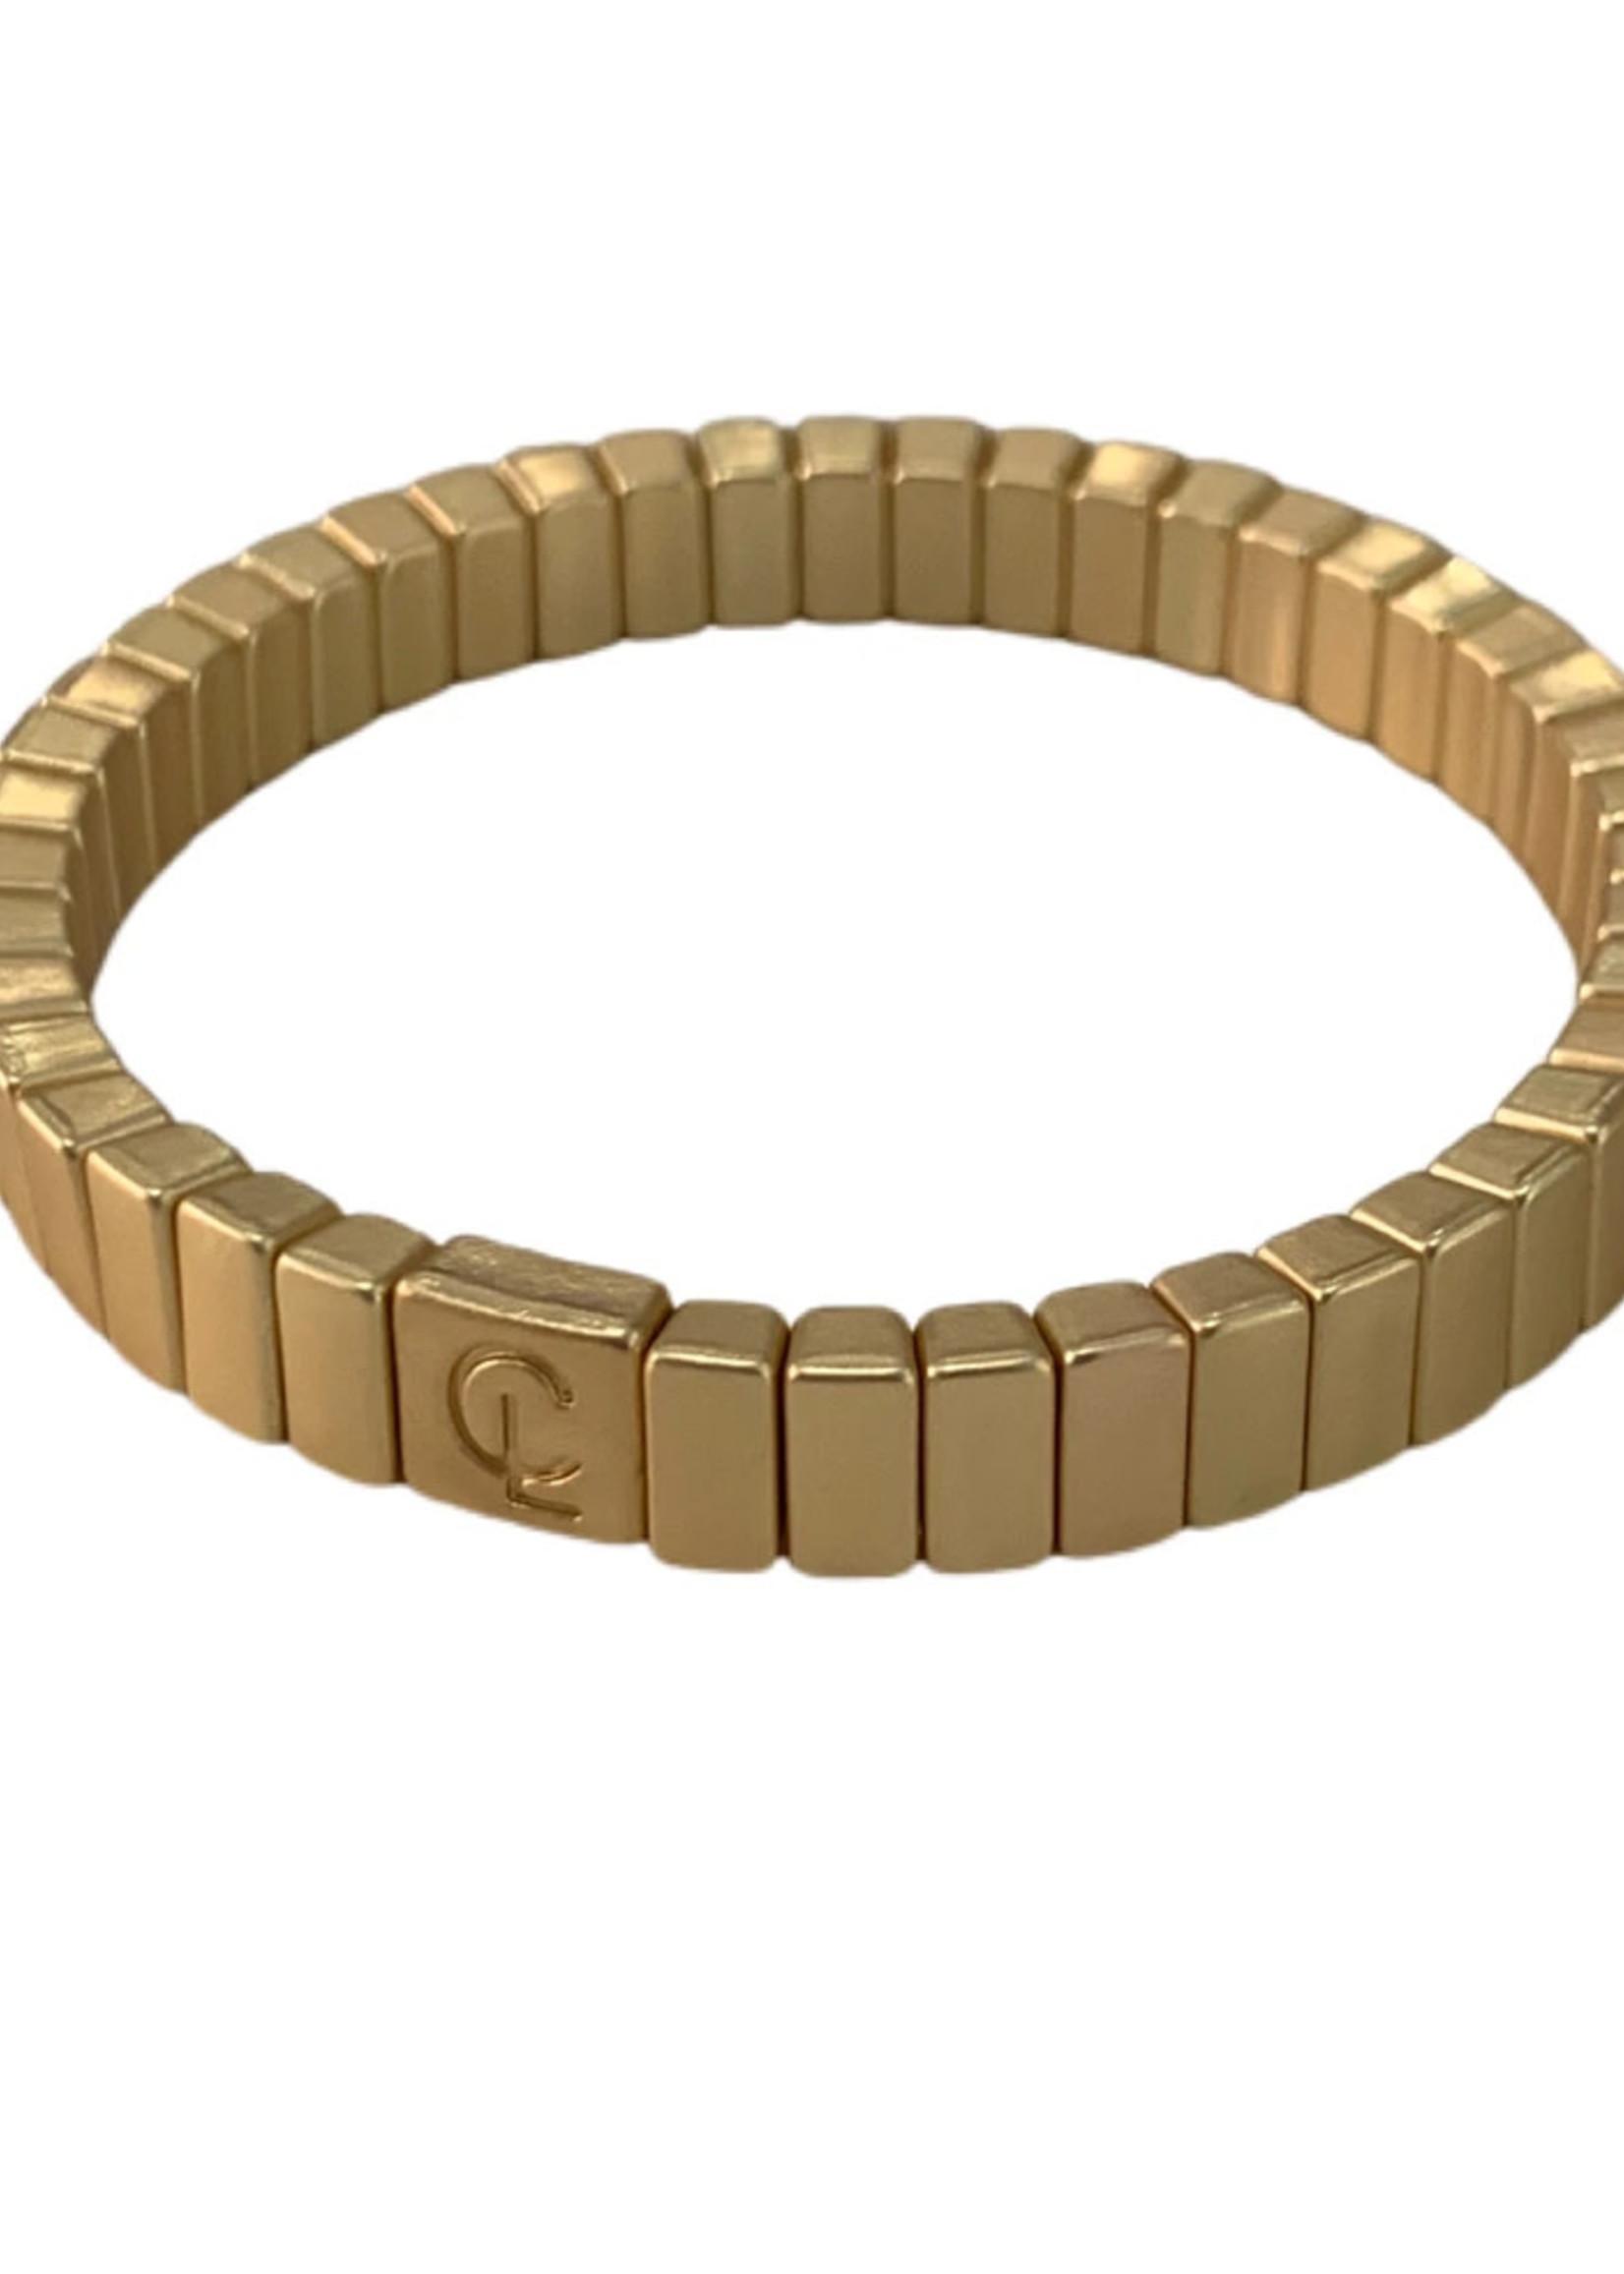 Tile Bracelet